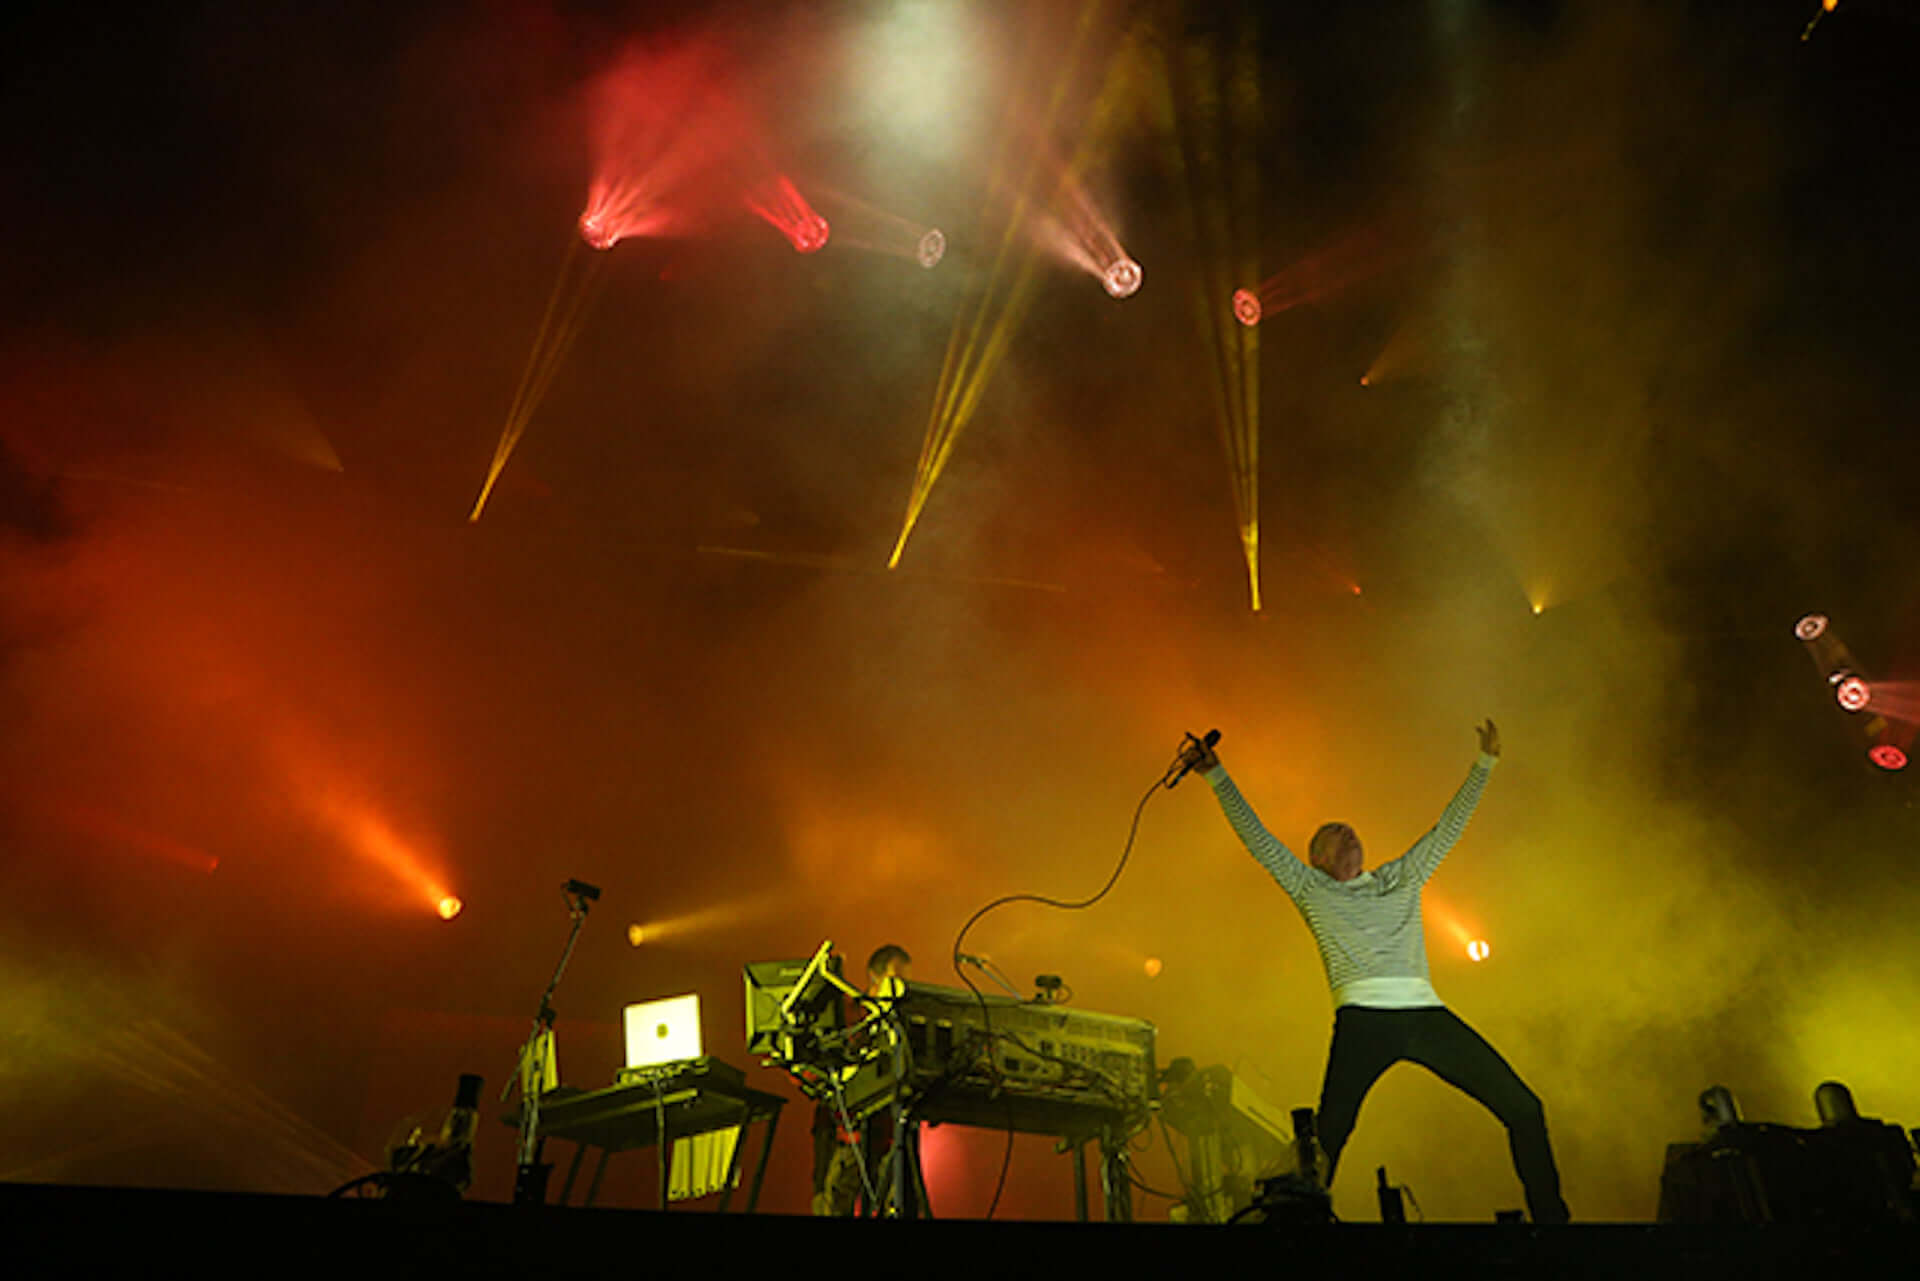 Underworldの伝説のステージ<SUMMER SONIC 2016>の記録映像が明日配信!当時のライブレポートが公開&公式Tシャツが復刻決定 music200626_underworld_9-1920x1281